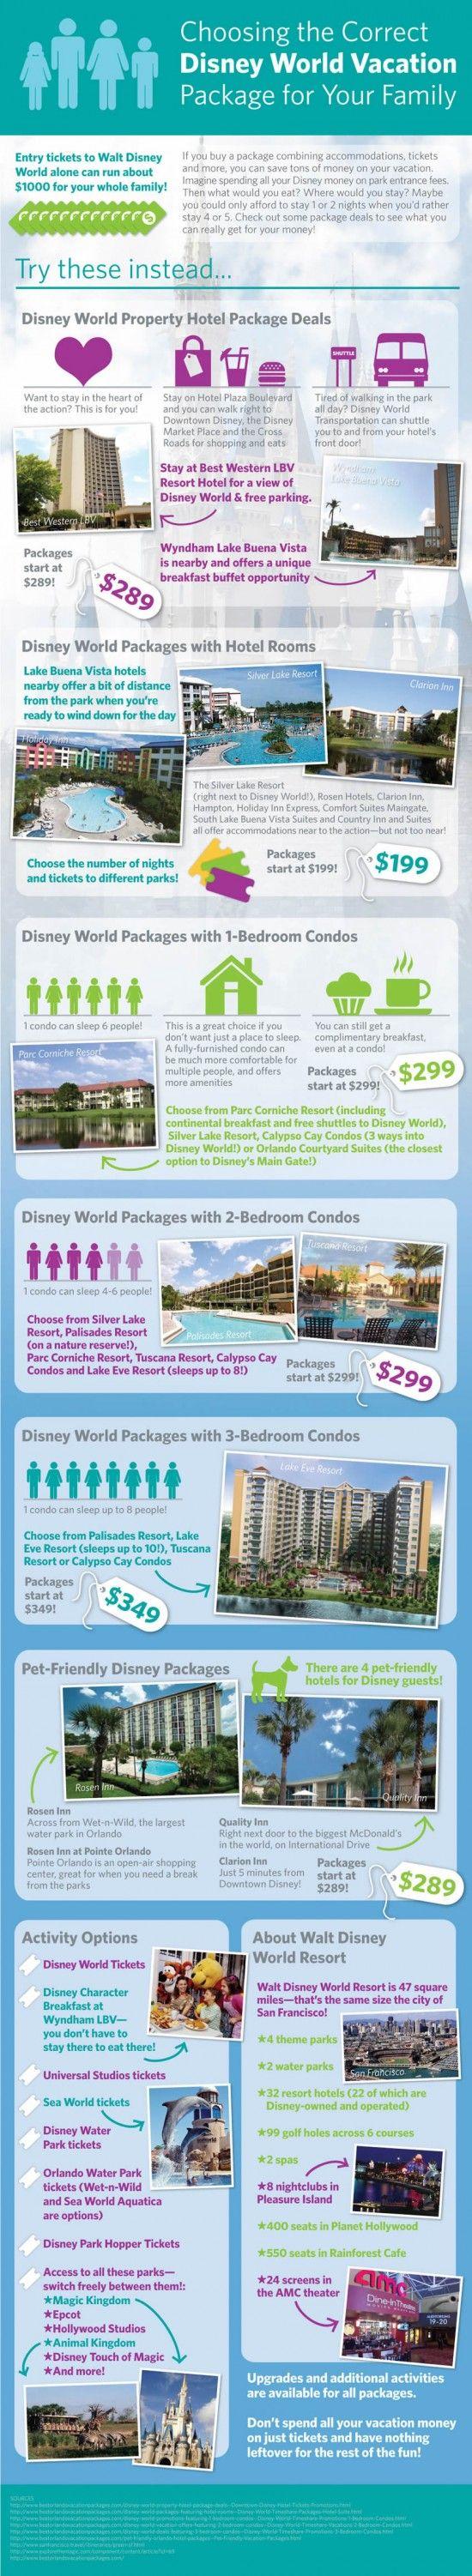 Choosing the Best Disney World Vacation Package